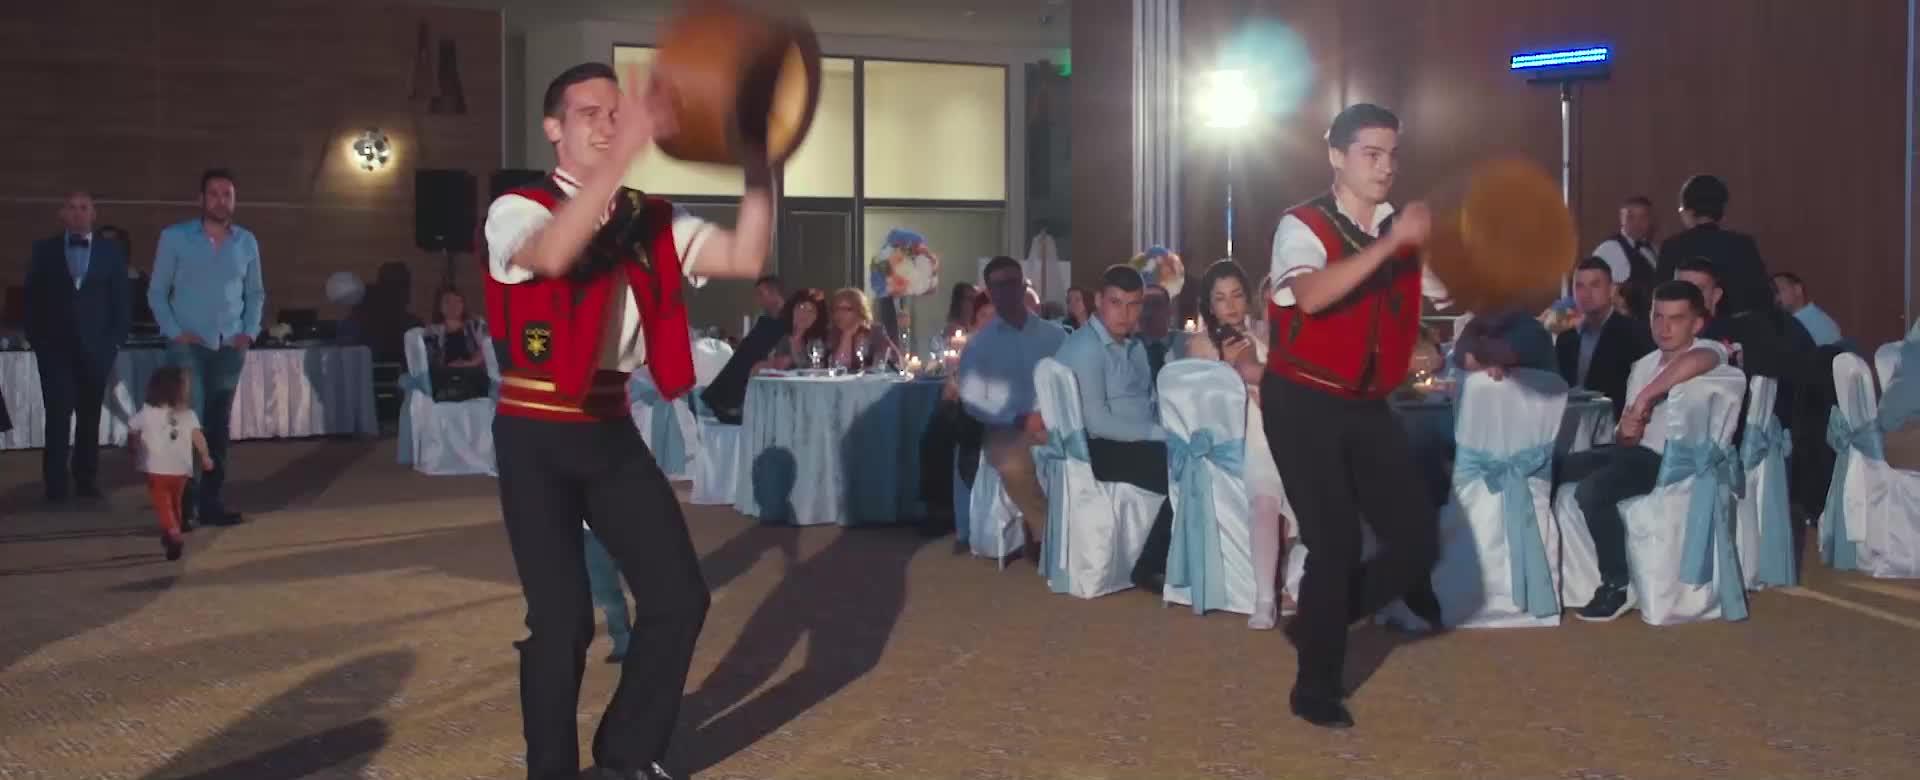 Wedding Cinematography - Dayana Trendafil